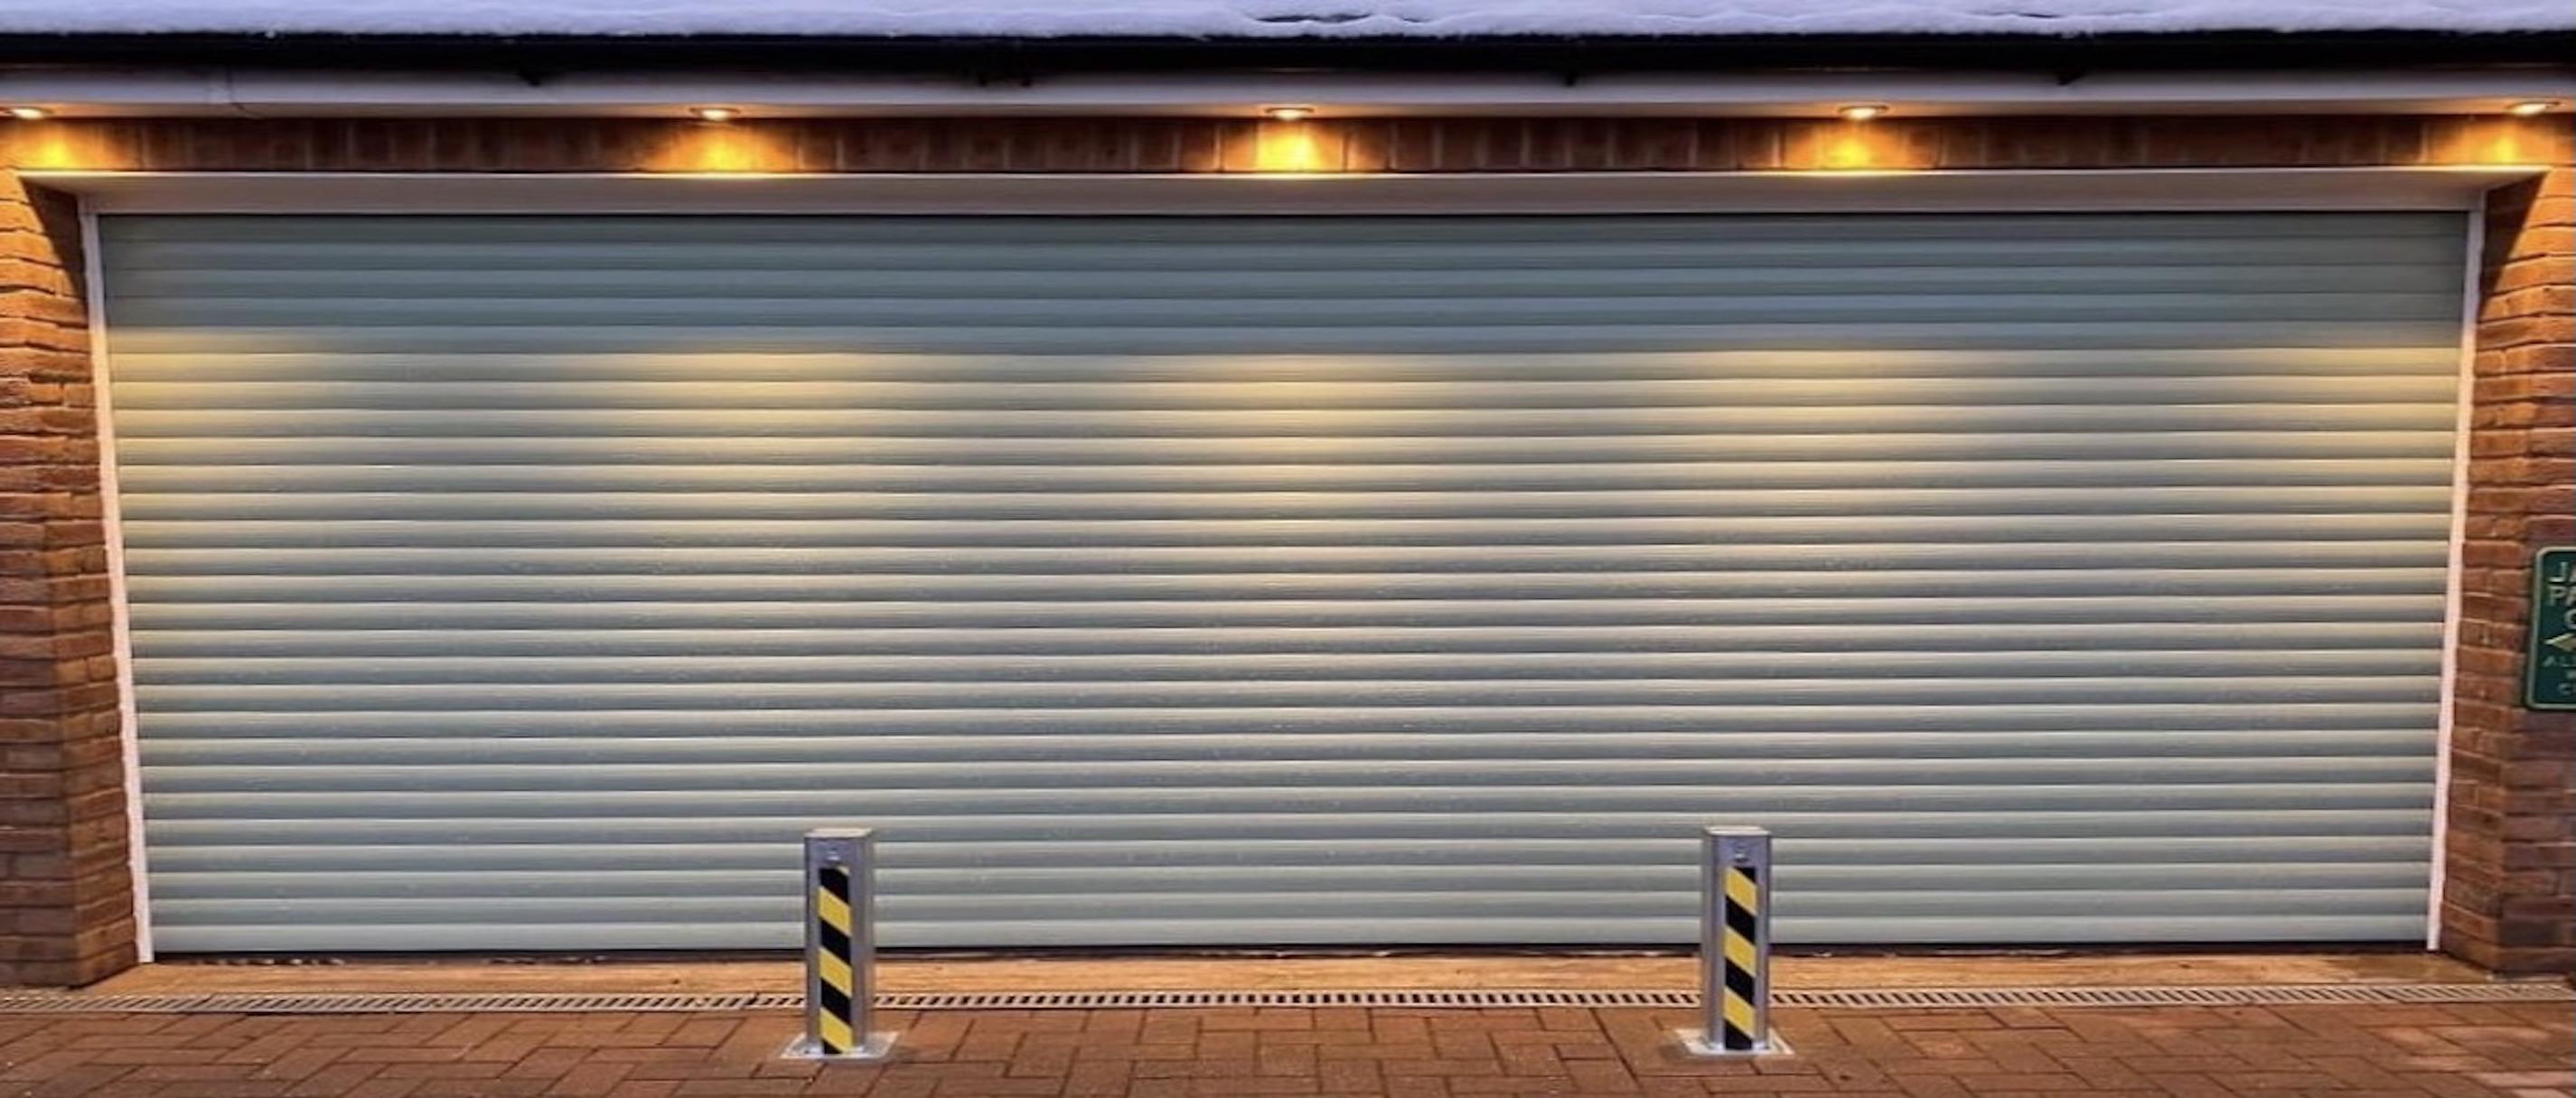 Driveway Security Bollards infant of garage